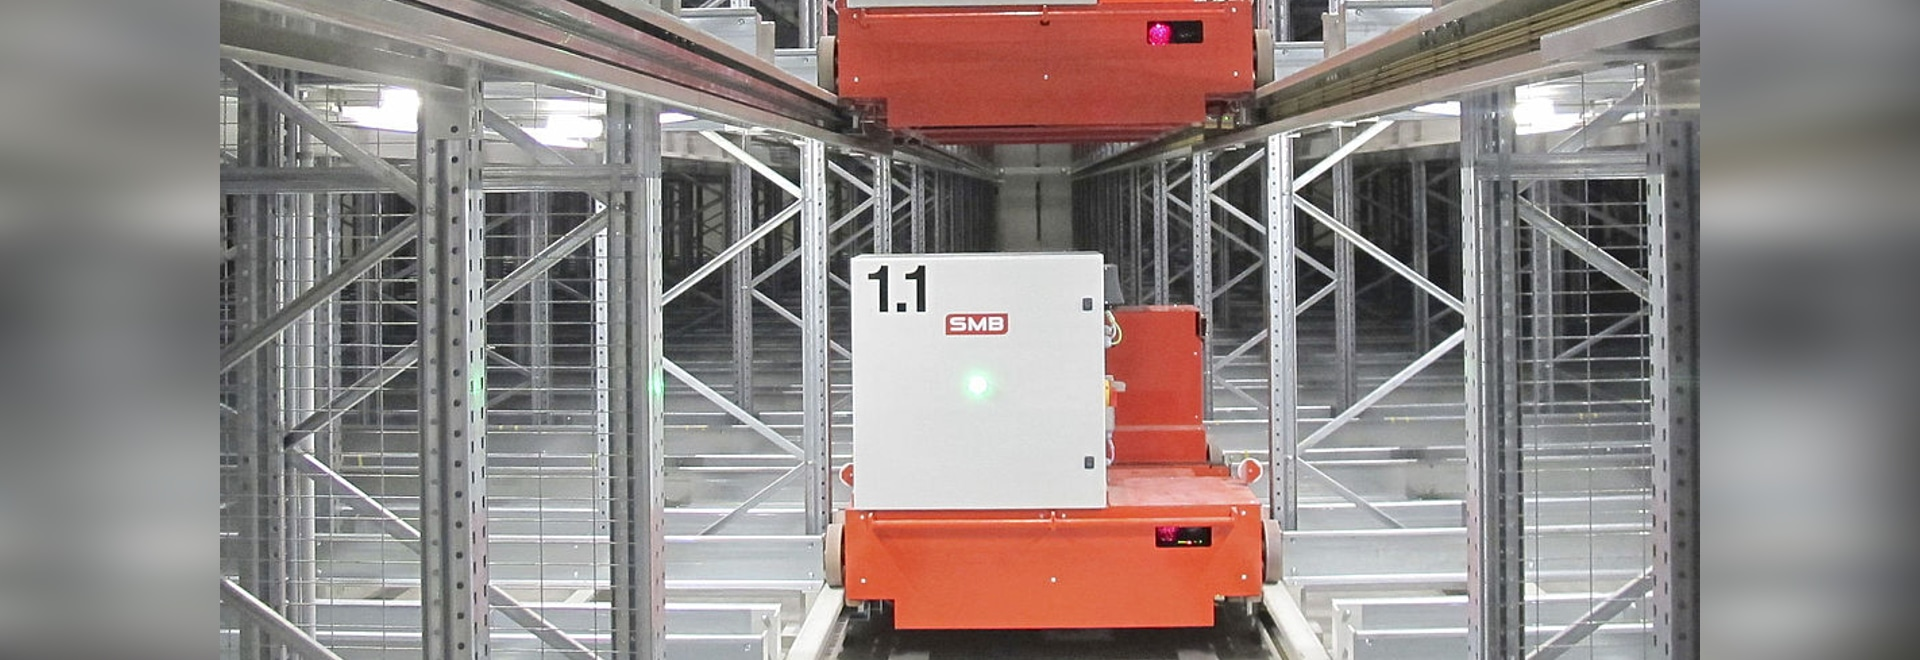 api awards major compact warehouse contract to SMB. SMB impresses with ultra-modern compact warehouses